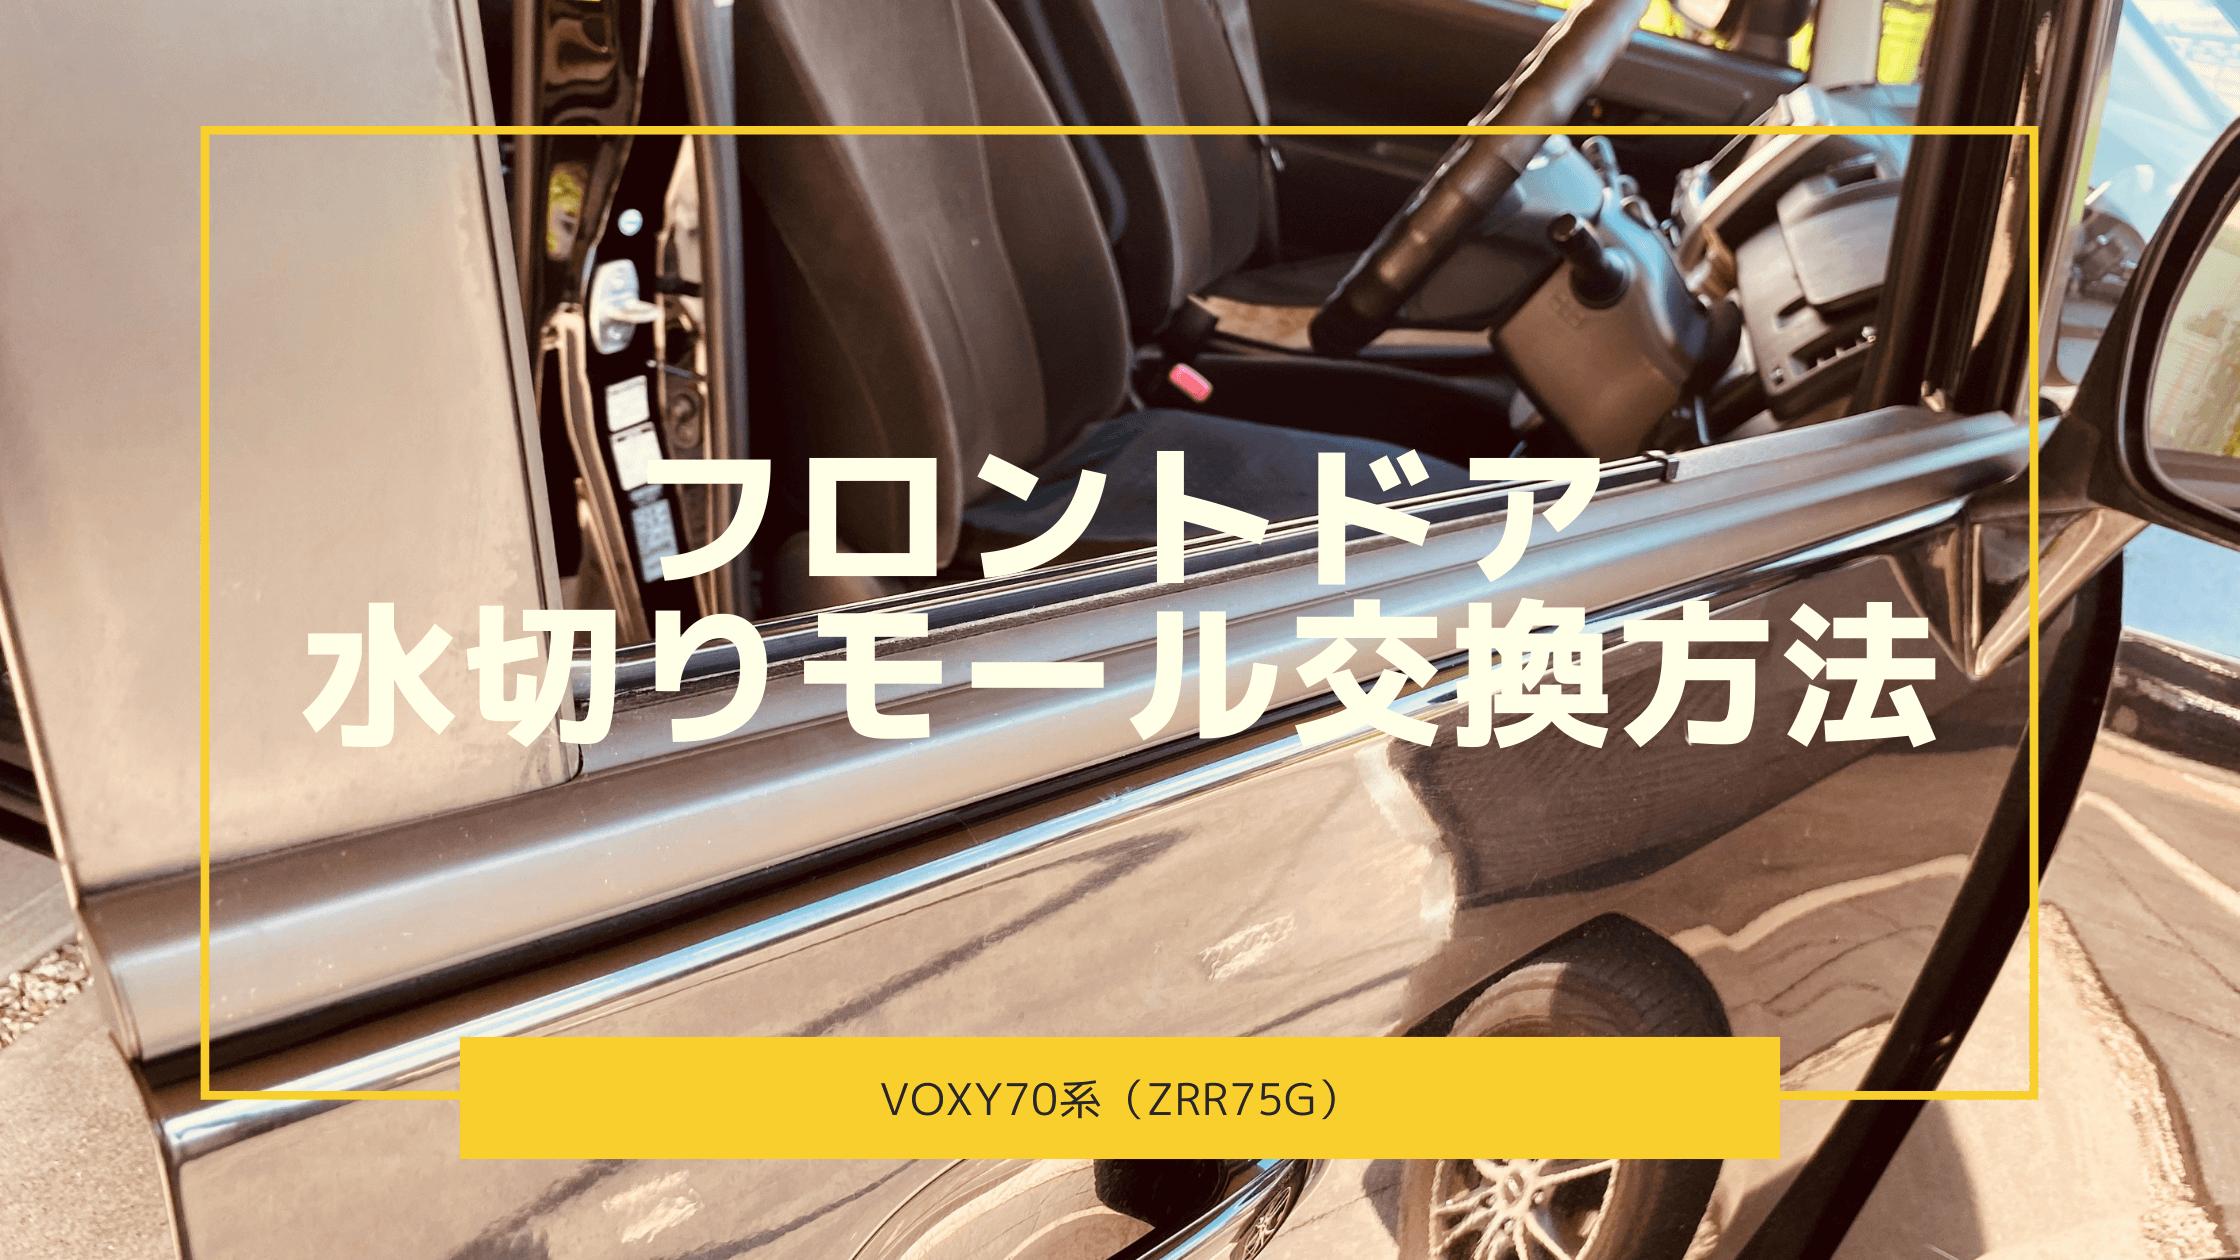 【VOXY70系】初心者向け!フロントドア水切りモールの交換方法5個